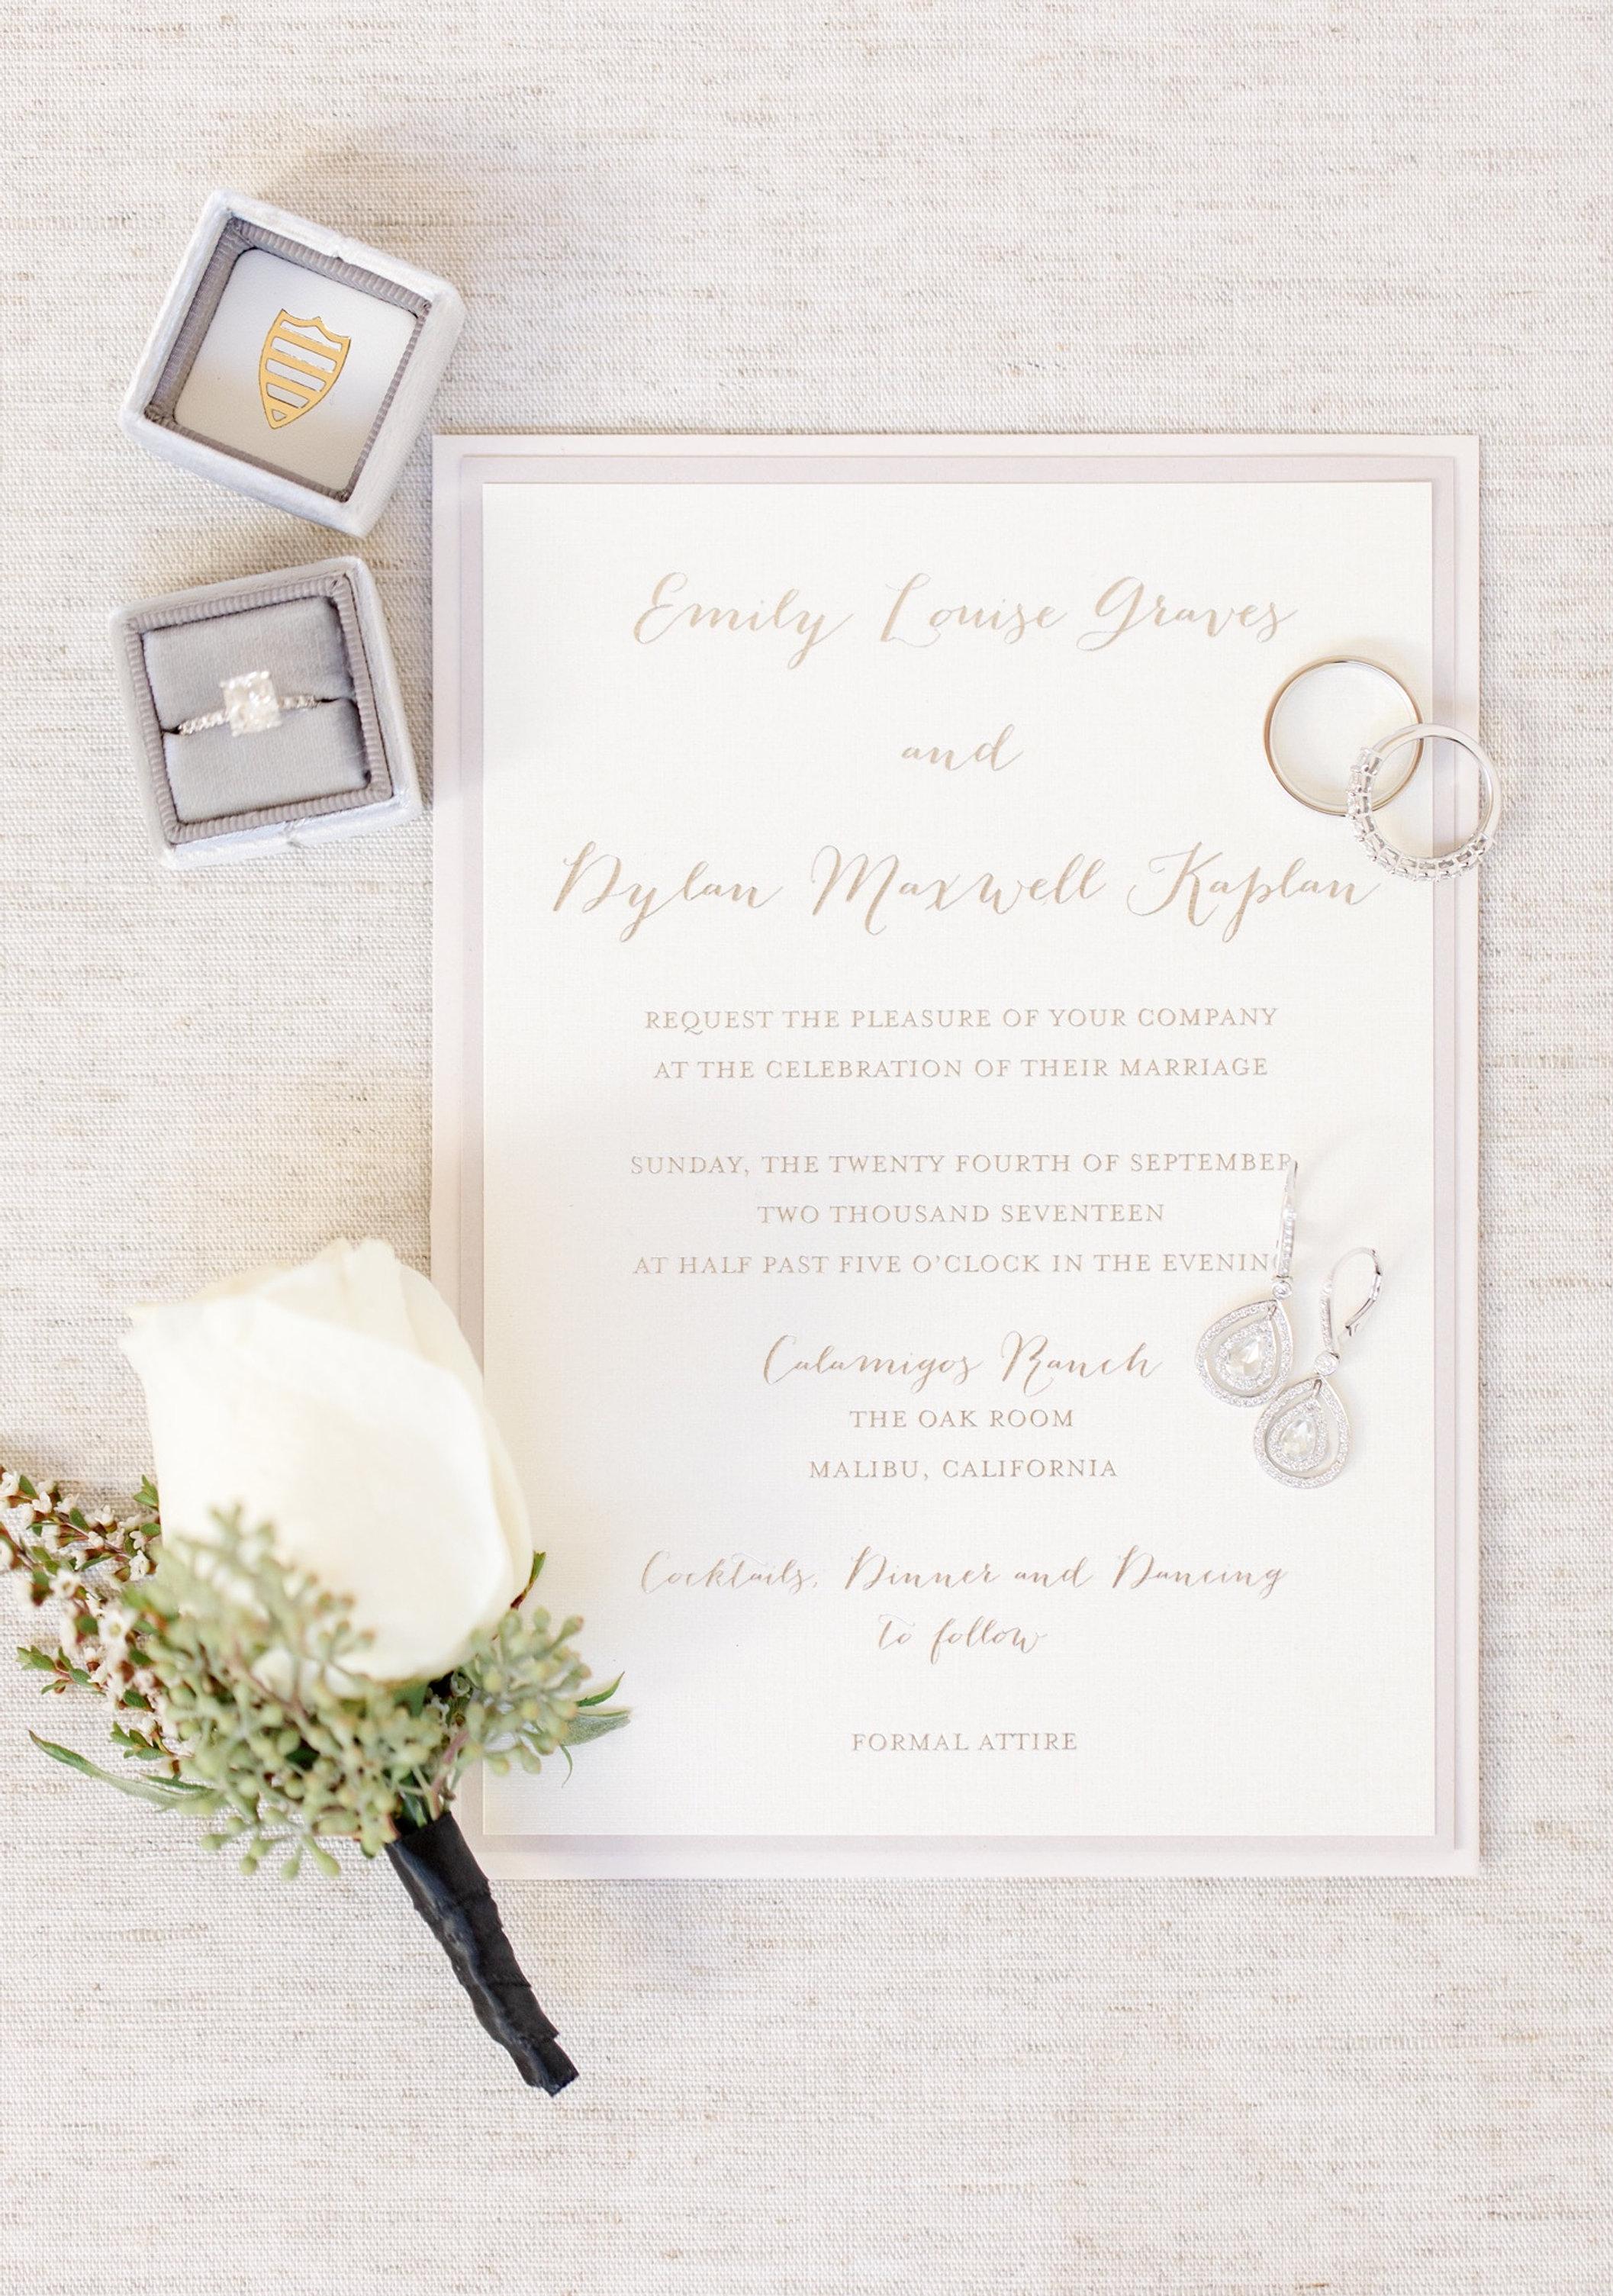 Custom Wedding Invitations Los Angeles & Burbank Occasion To Celebrate